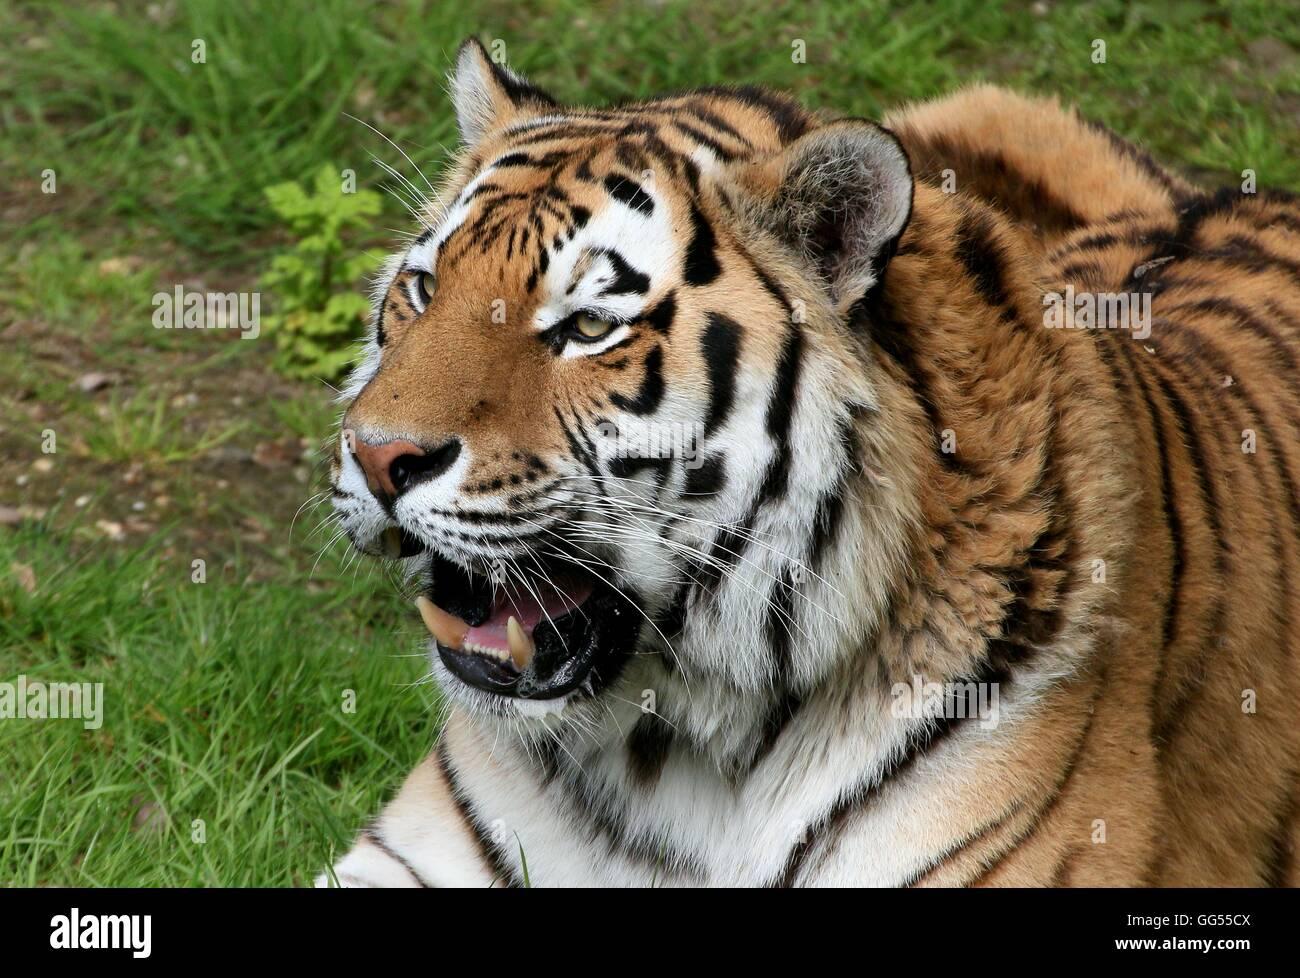 Growling  male Siberian or Amur tiger (Panthera tigris altaica) in closeup - Stock Image